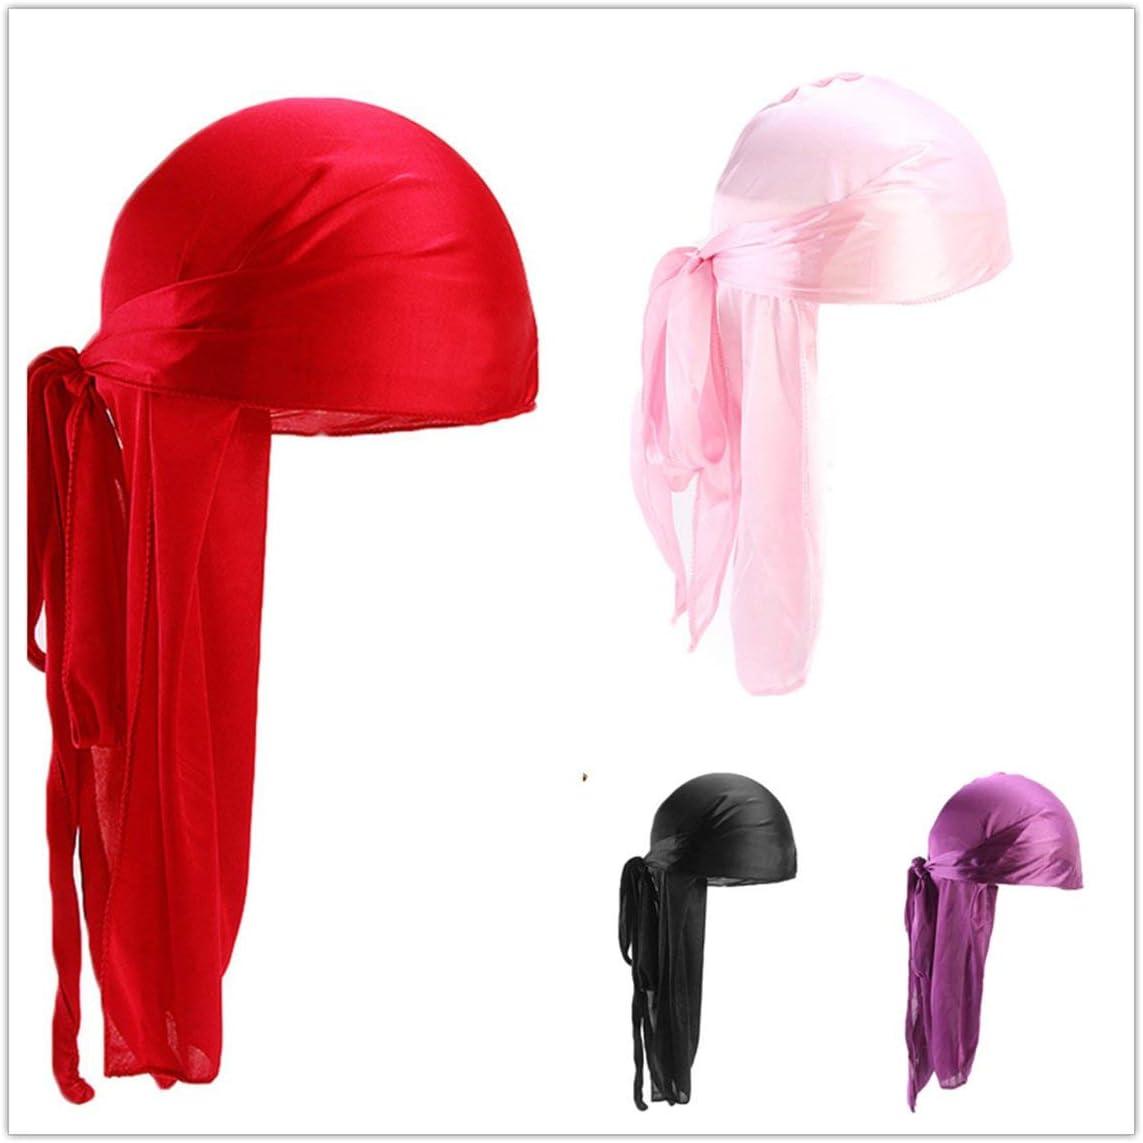 Colore: Nero Garciayia Uomo Donna Raso di Seta Traspirante Silky Durag 360 Wave Cool Bandana Hat Turban